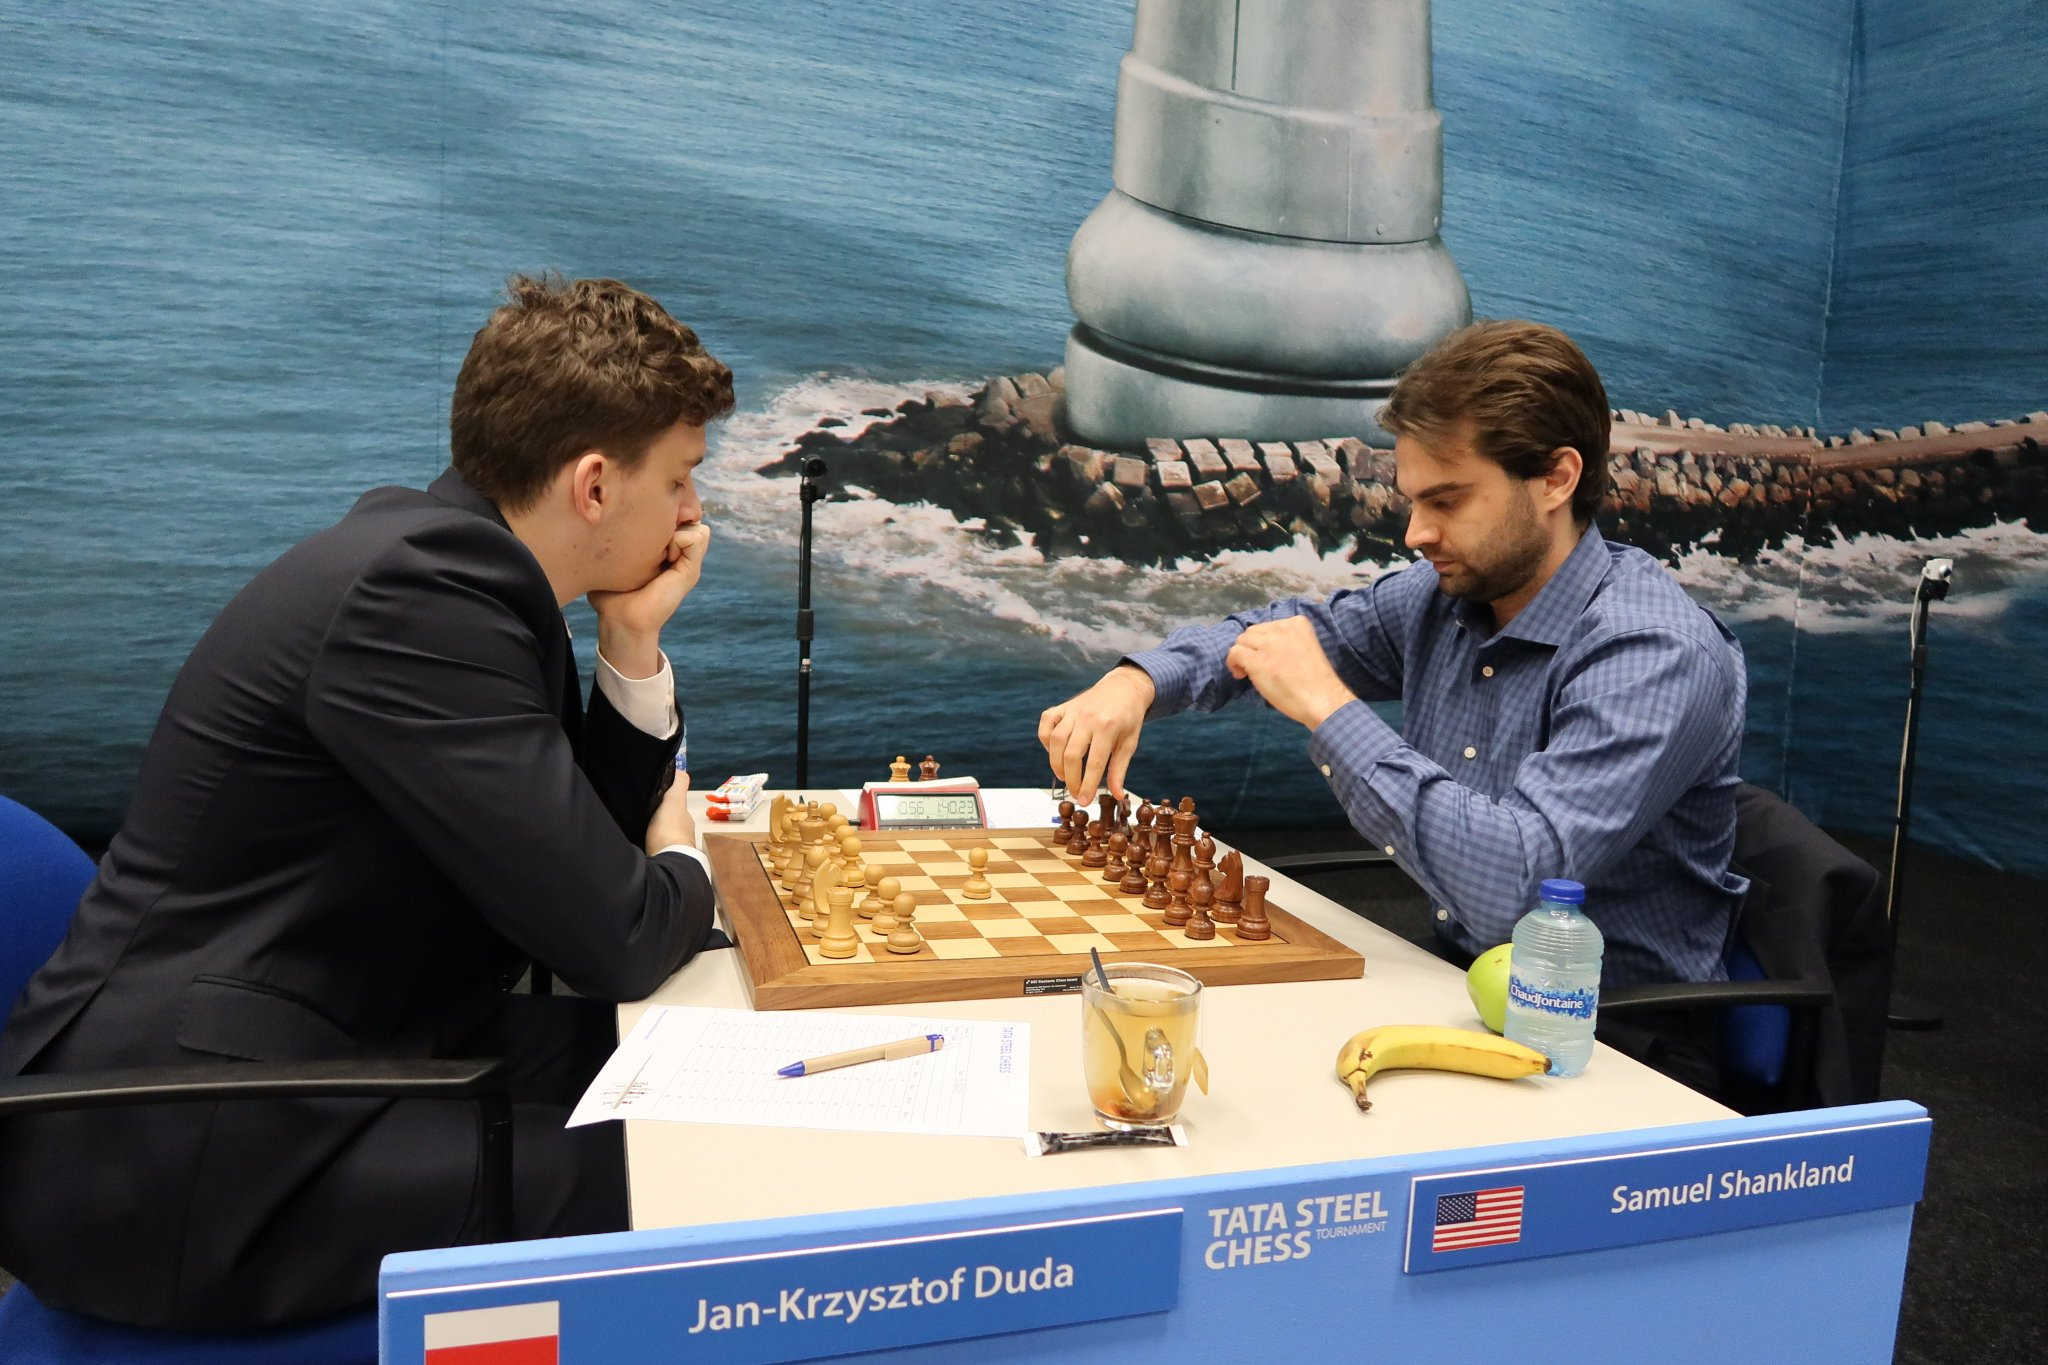 Jan-Krzysztof-Duda-Samuel-Shankland